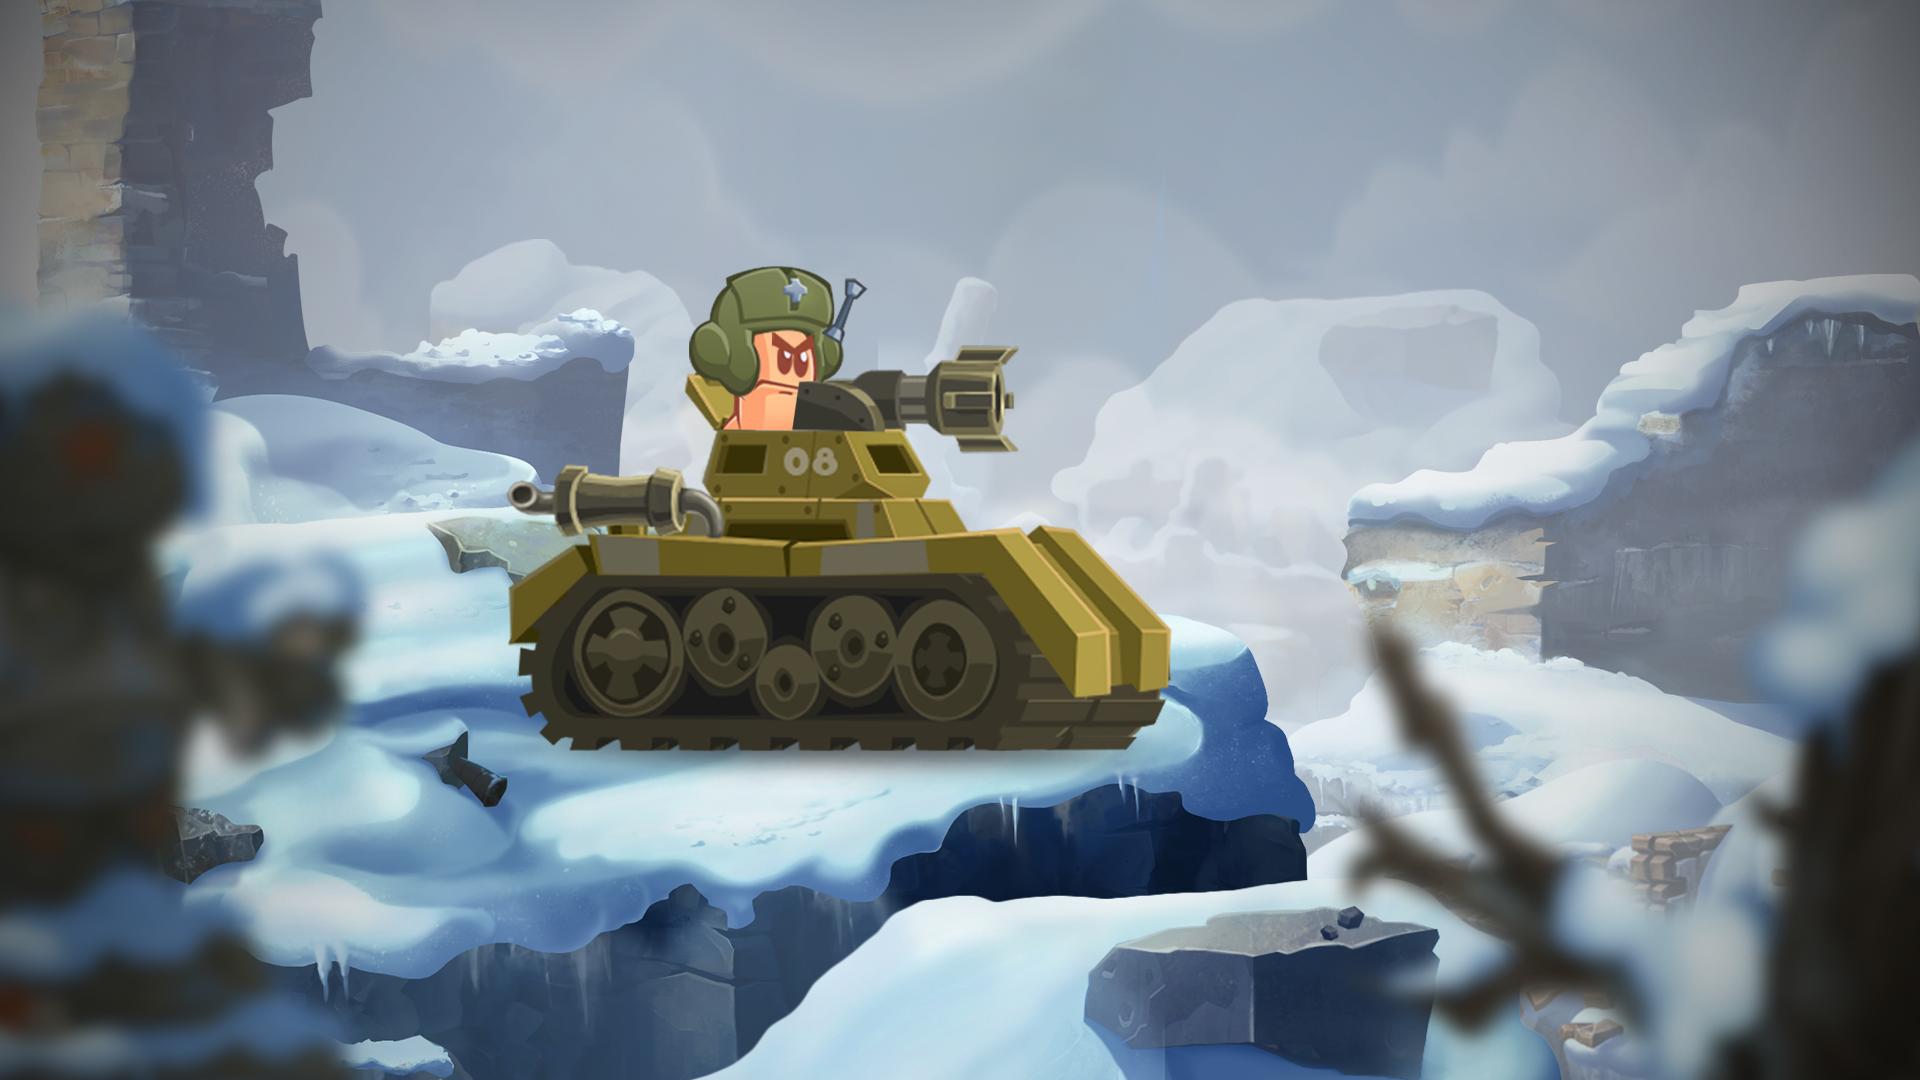 Tanks a lot buddy